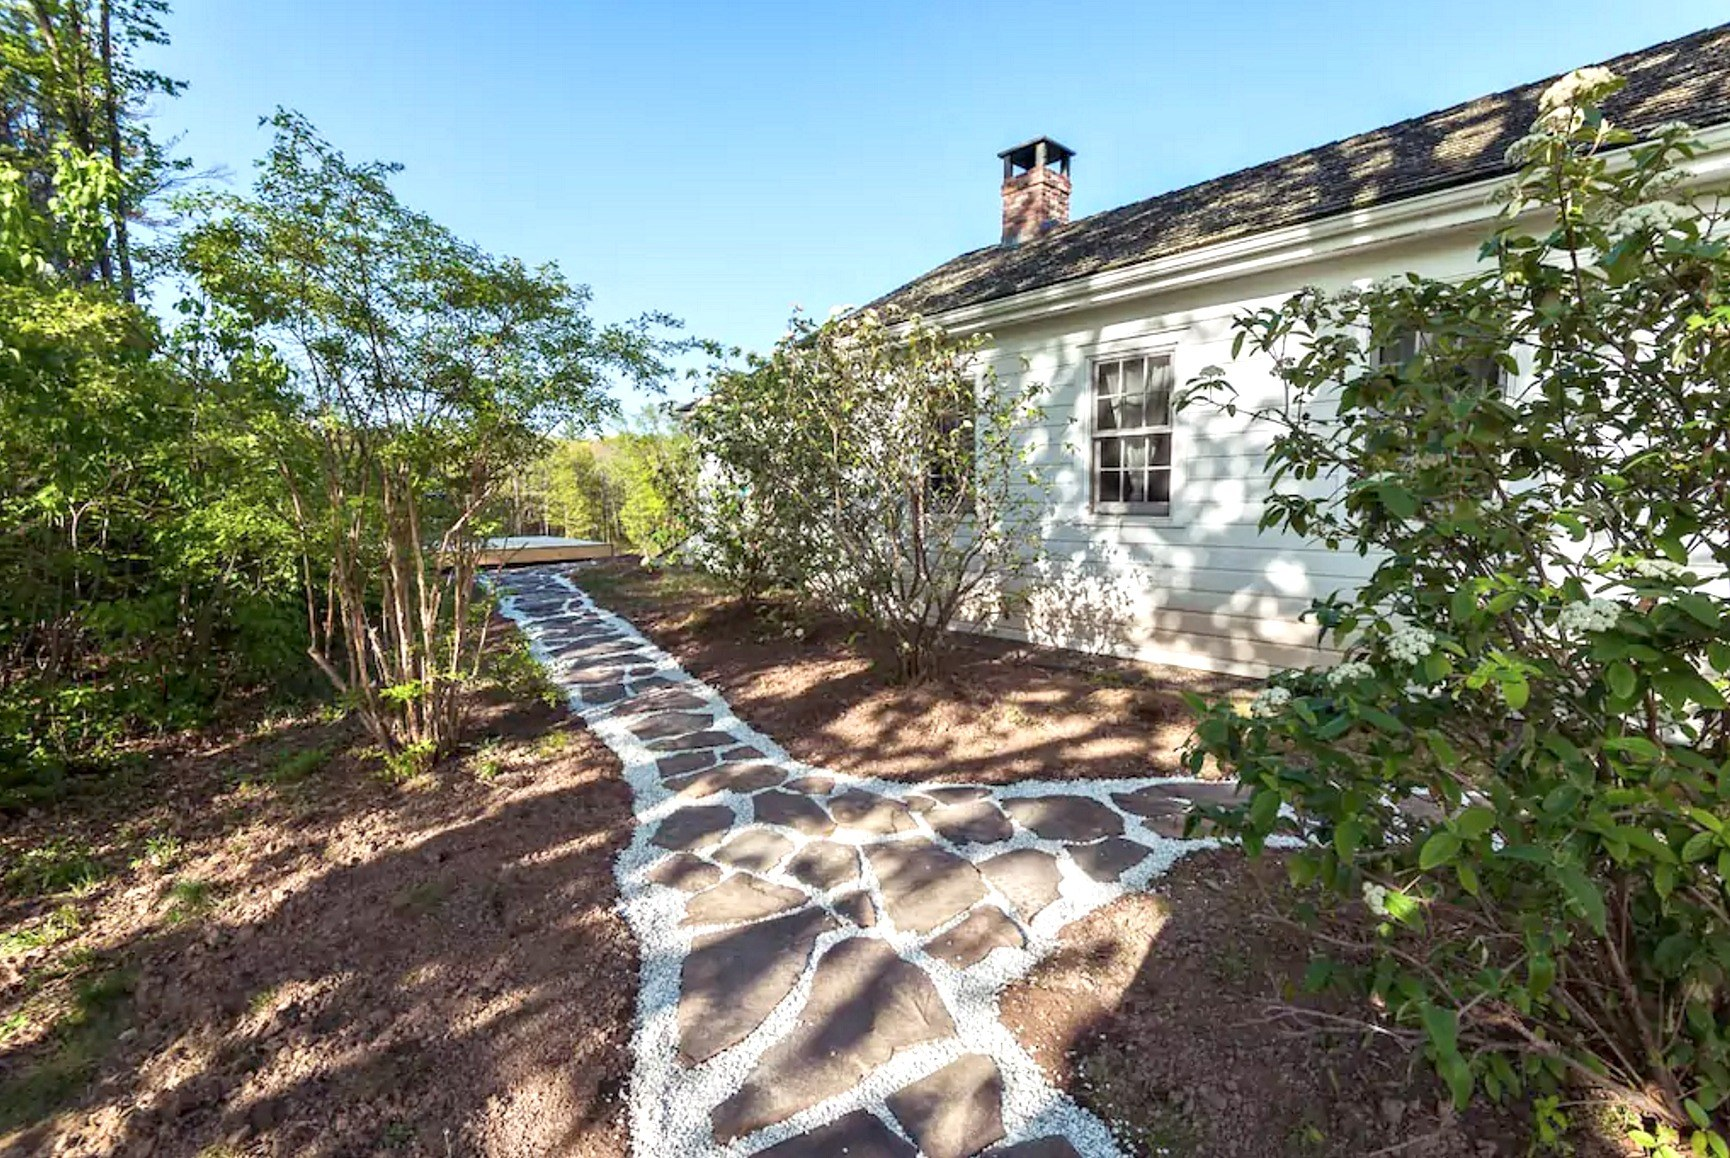 catskills-schoolhouse-airbnb-16